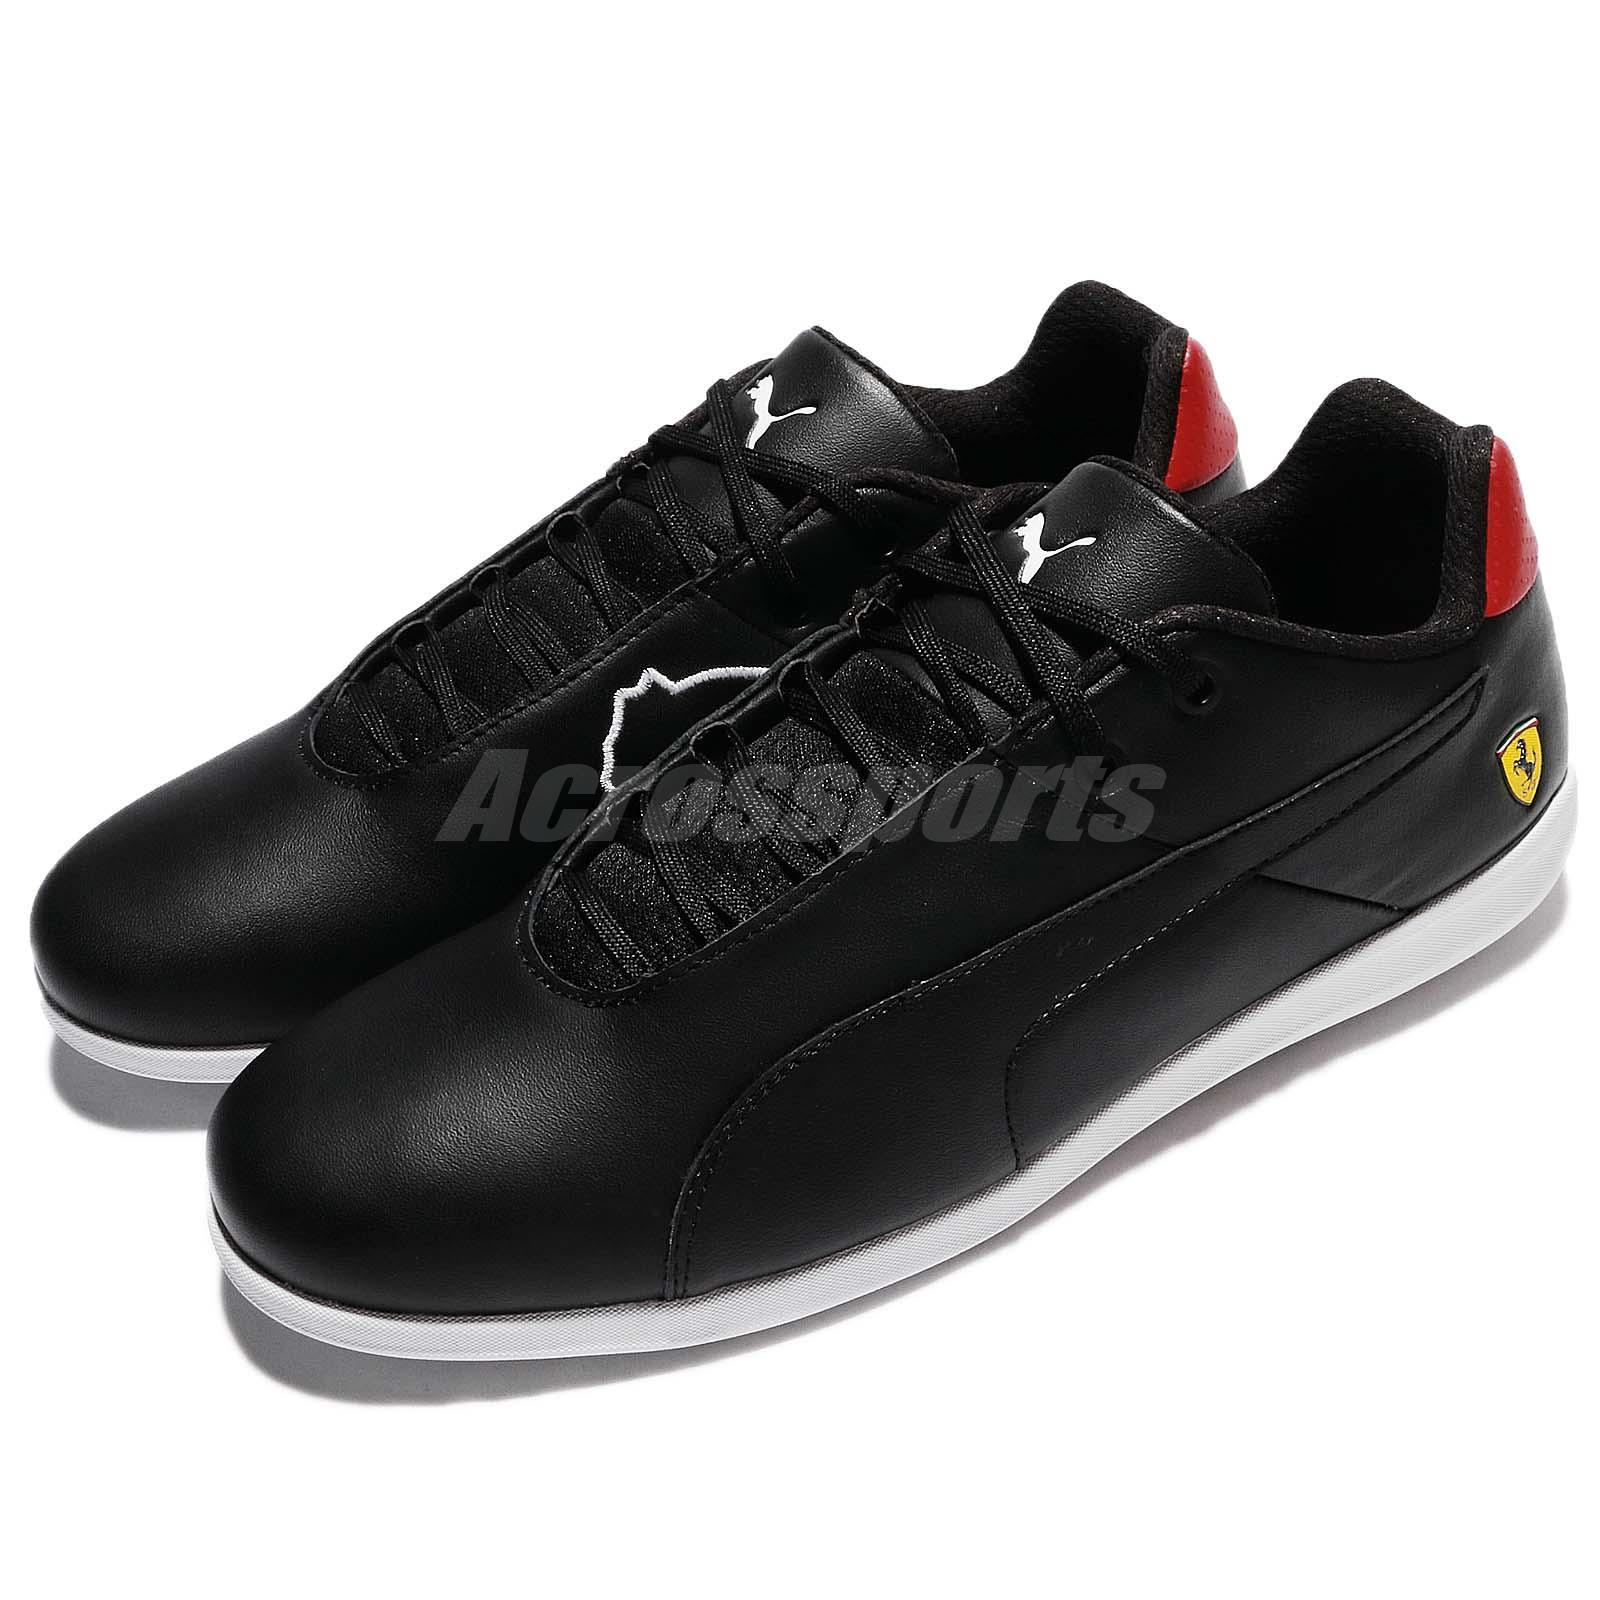 3e912d3a22bb Details about Puma SF Future Cat Casual Ferrari Black Rosso Corsa Leather Men  Shoe 306001-02